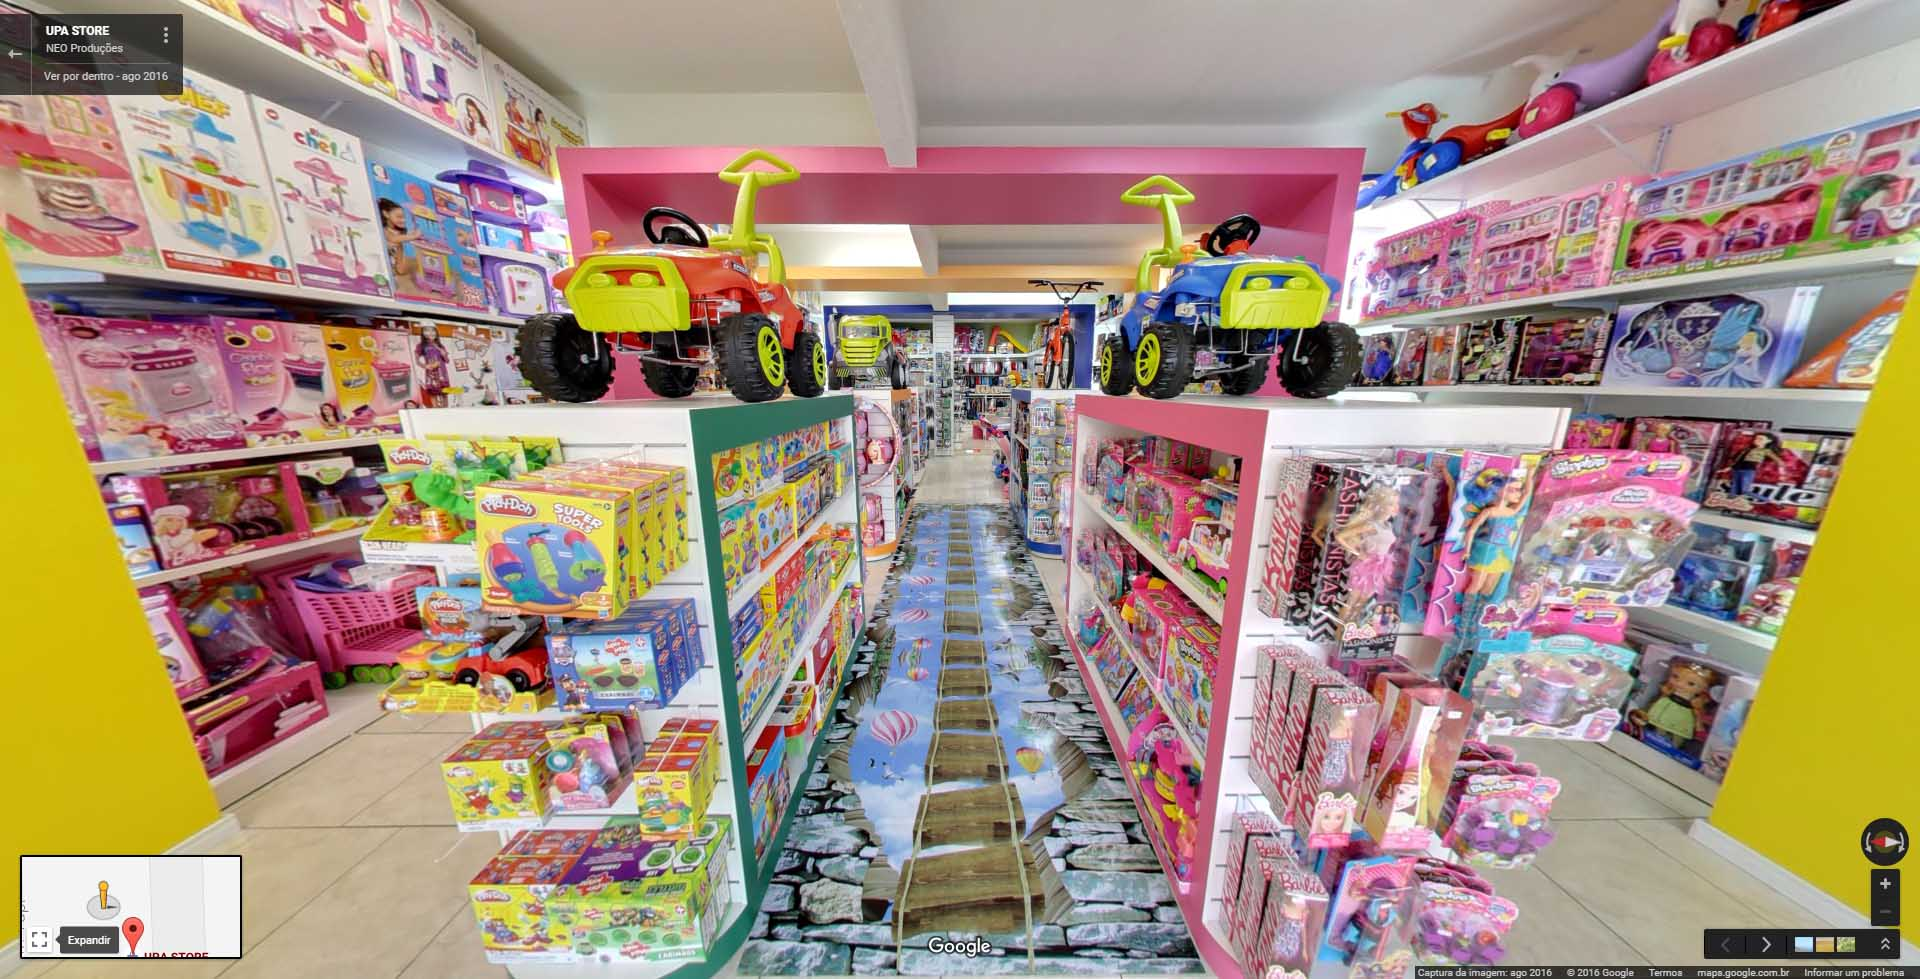 UPA Store